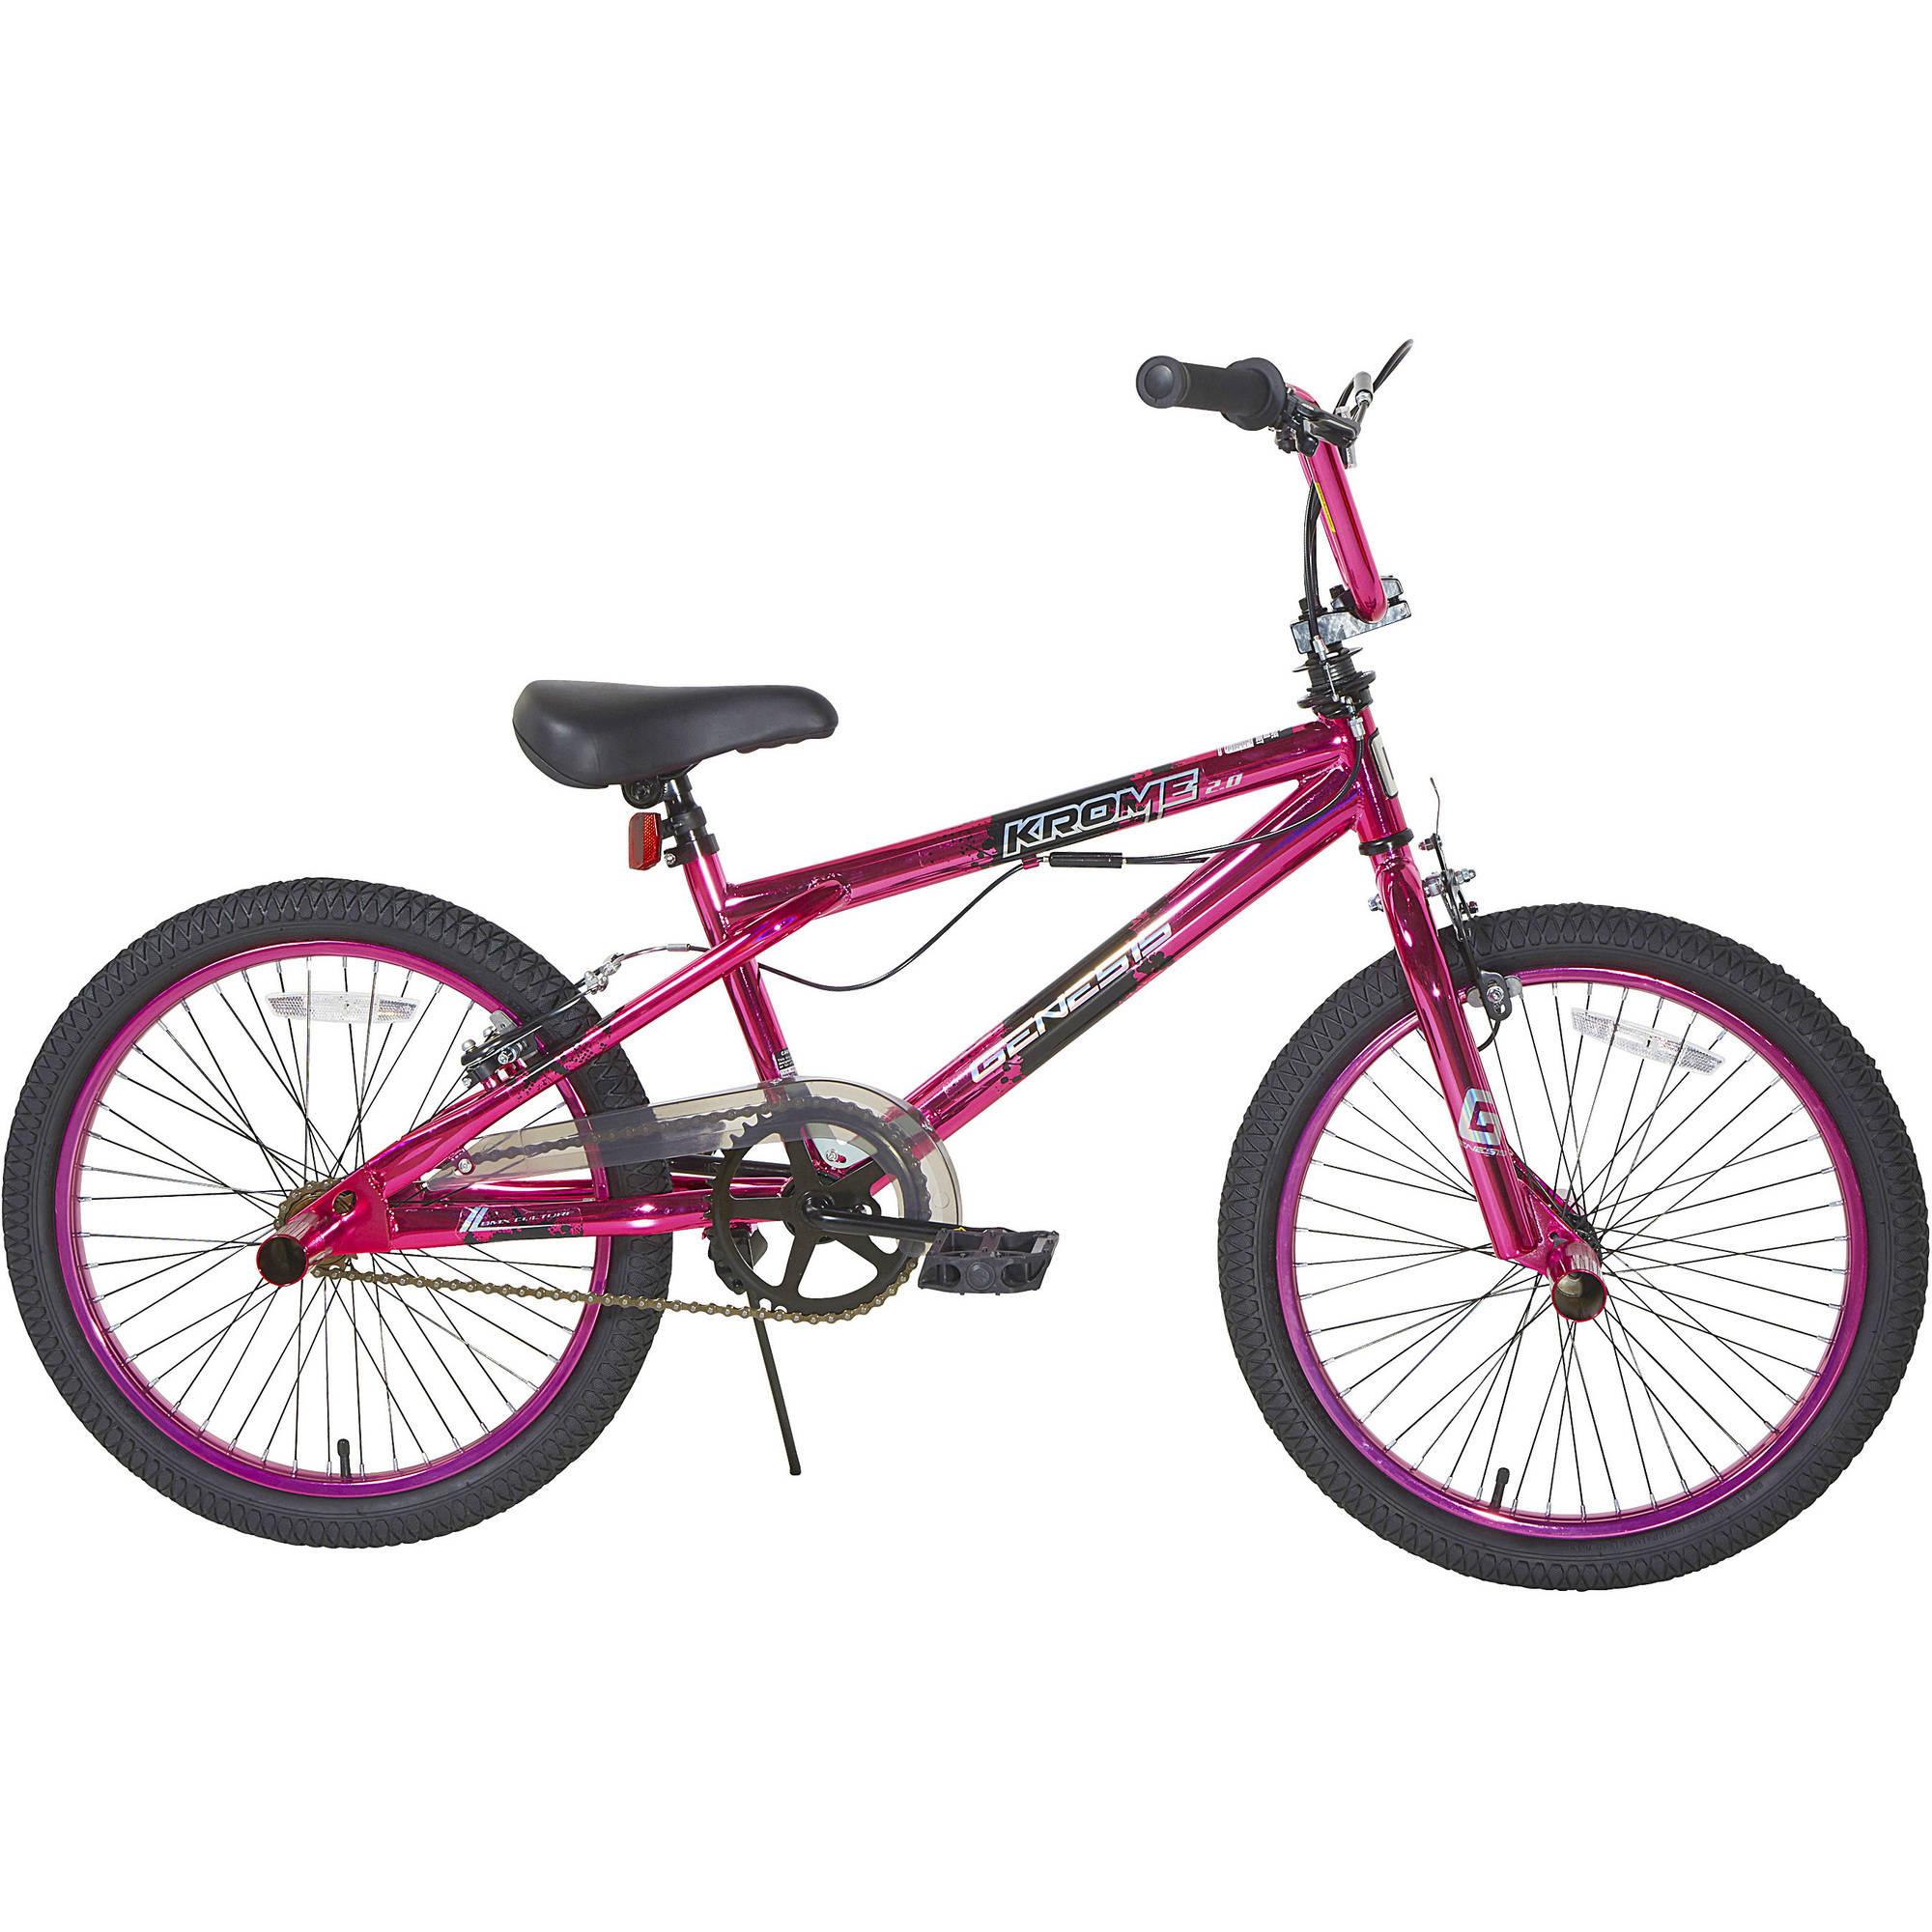 "Genesis 20"" Girls' Krome 2.0 Freestyle Bike-pink"